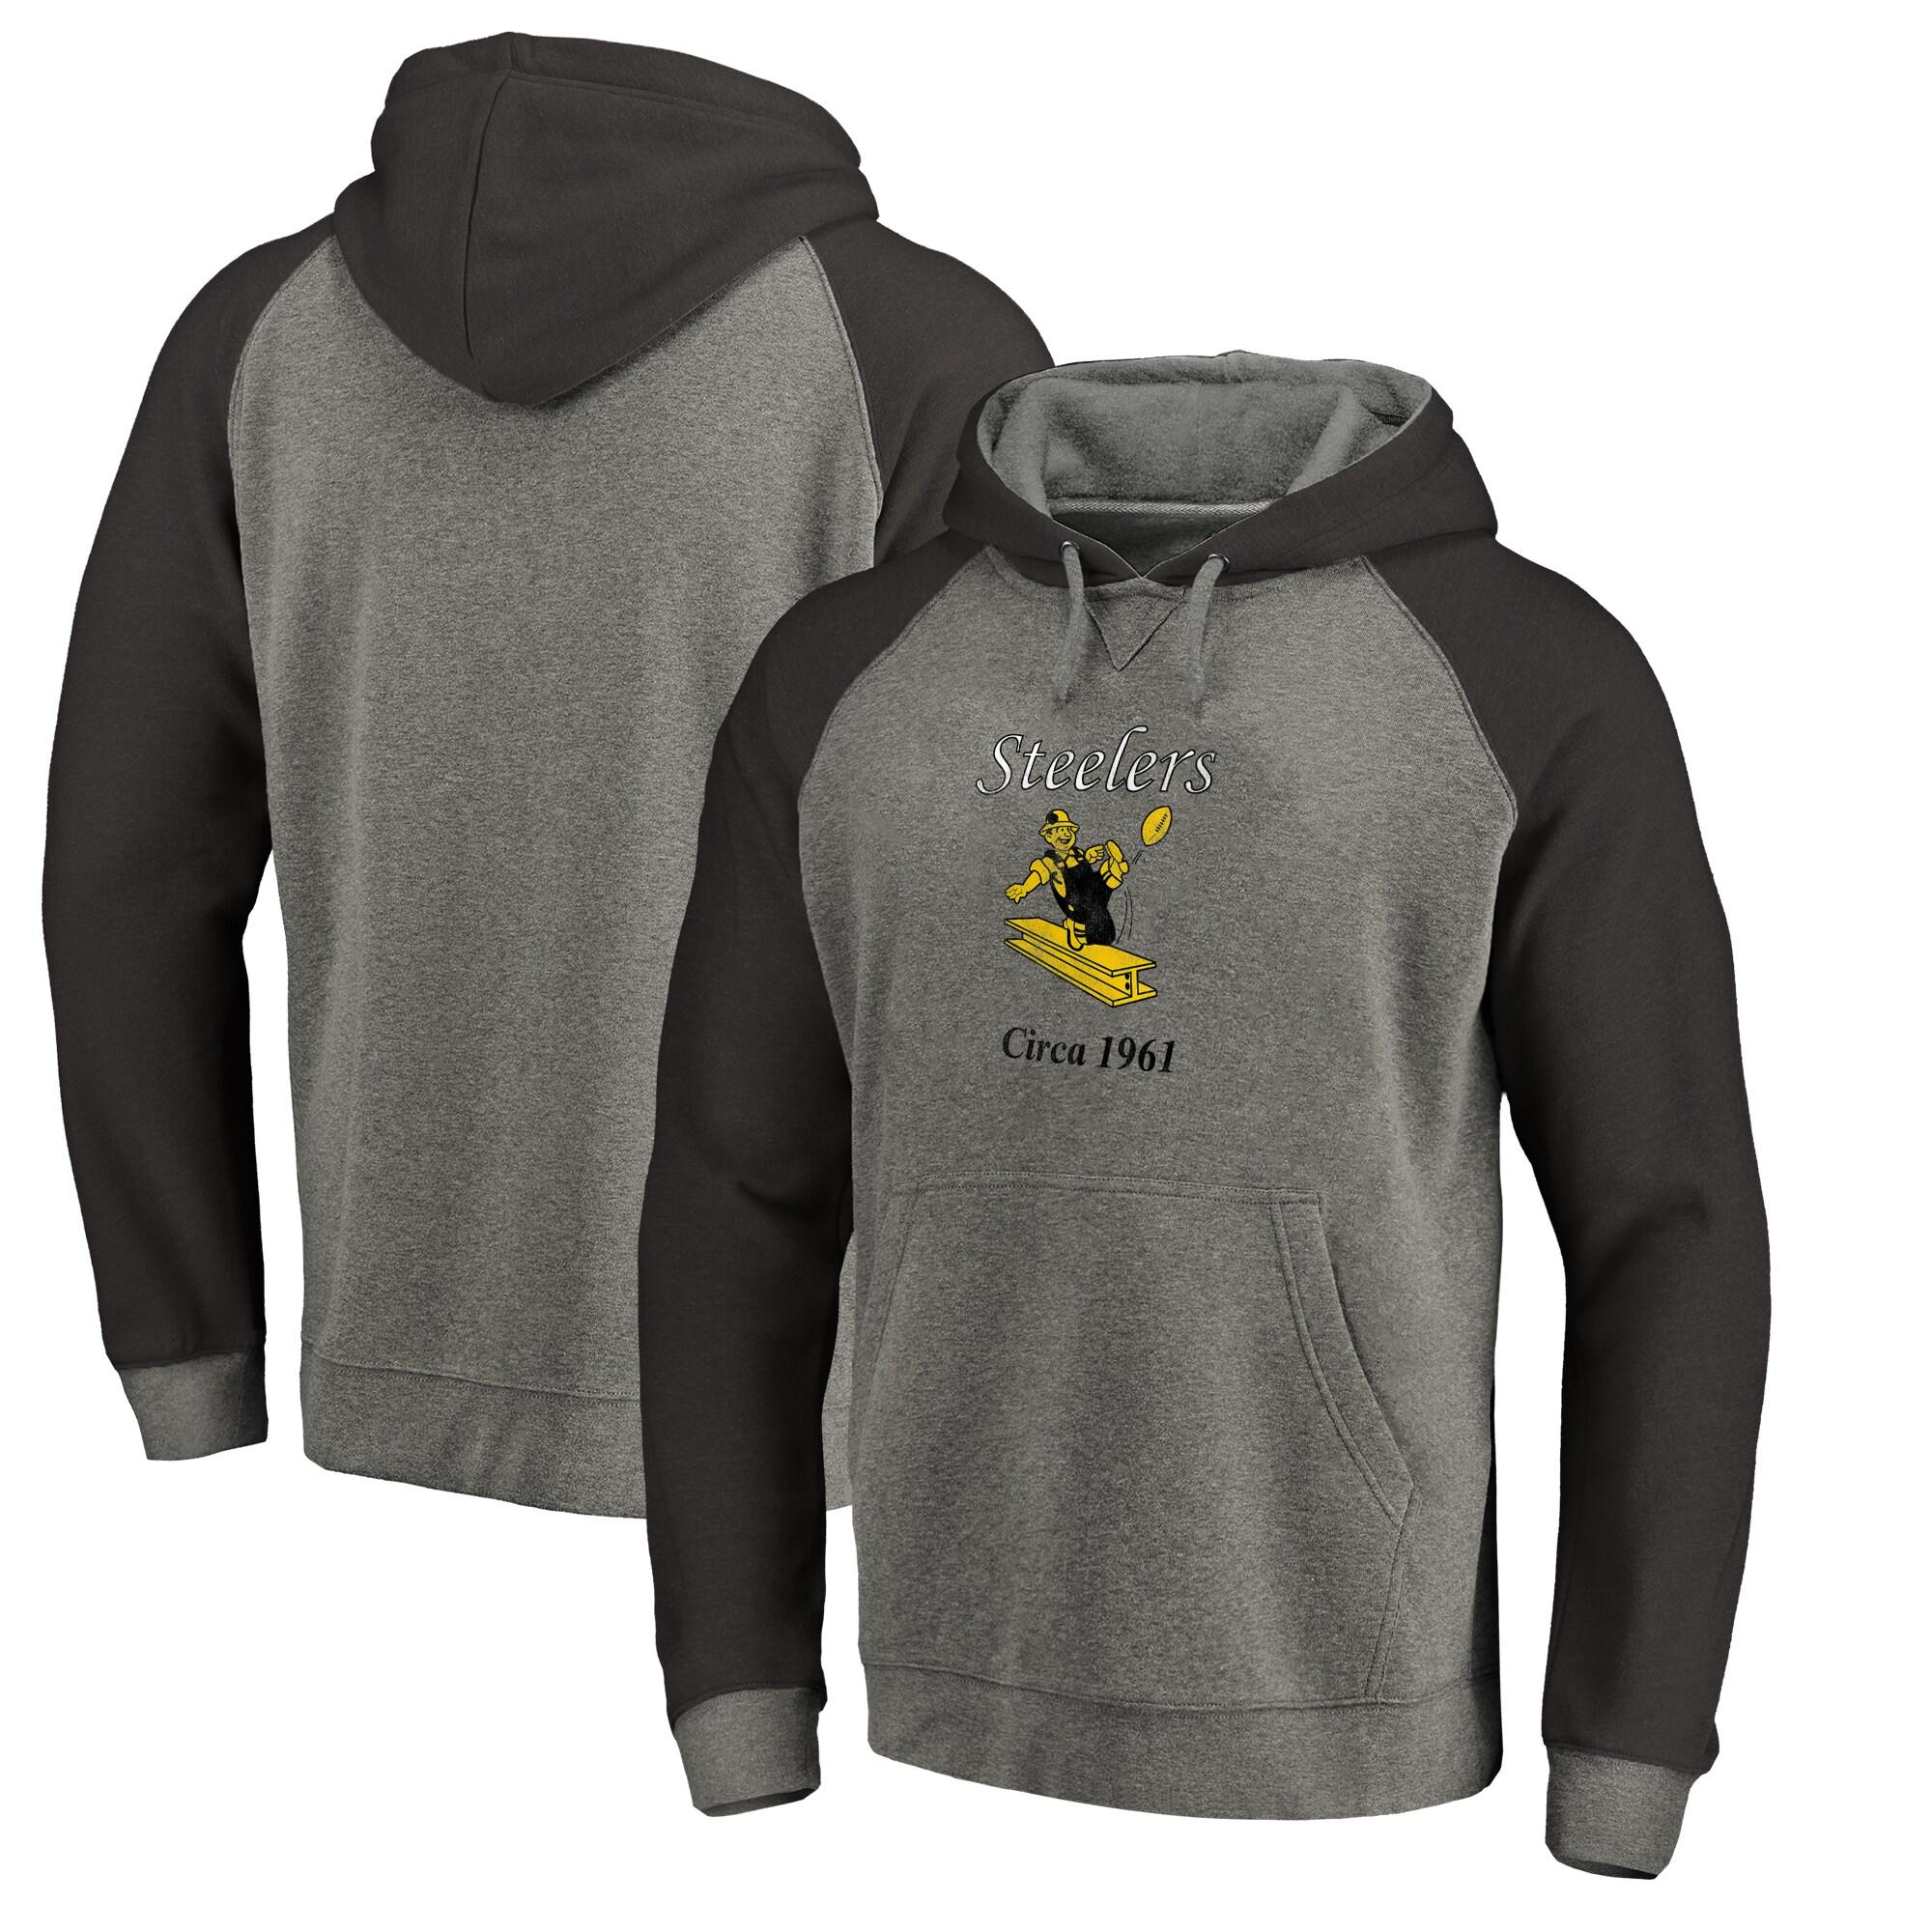 Pittsburgh Steelers NFL Pro Line by Fanatics Branded Throwback Logo Tri-Blend Raglan Pullover Hoodie - Gray/Black